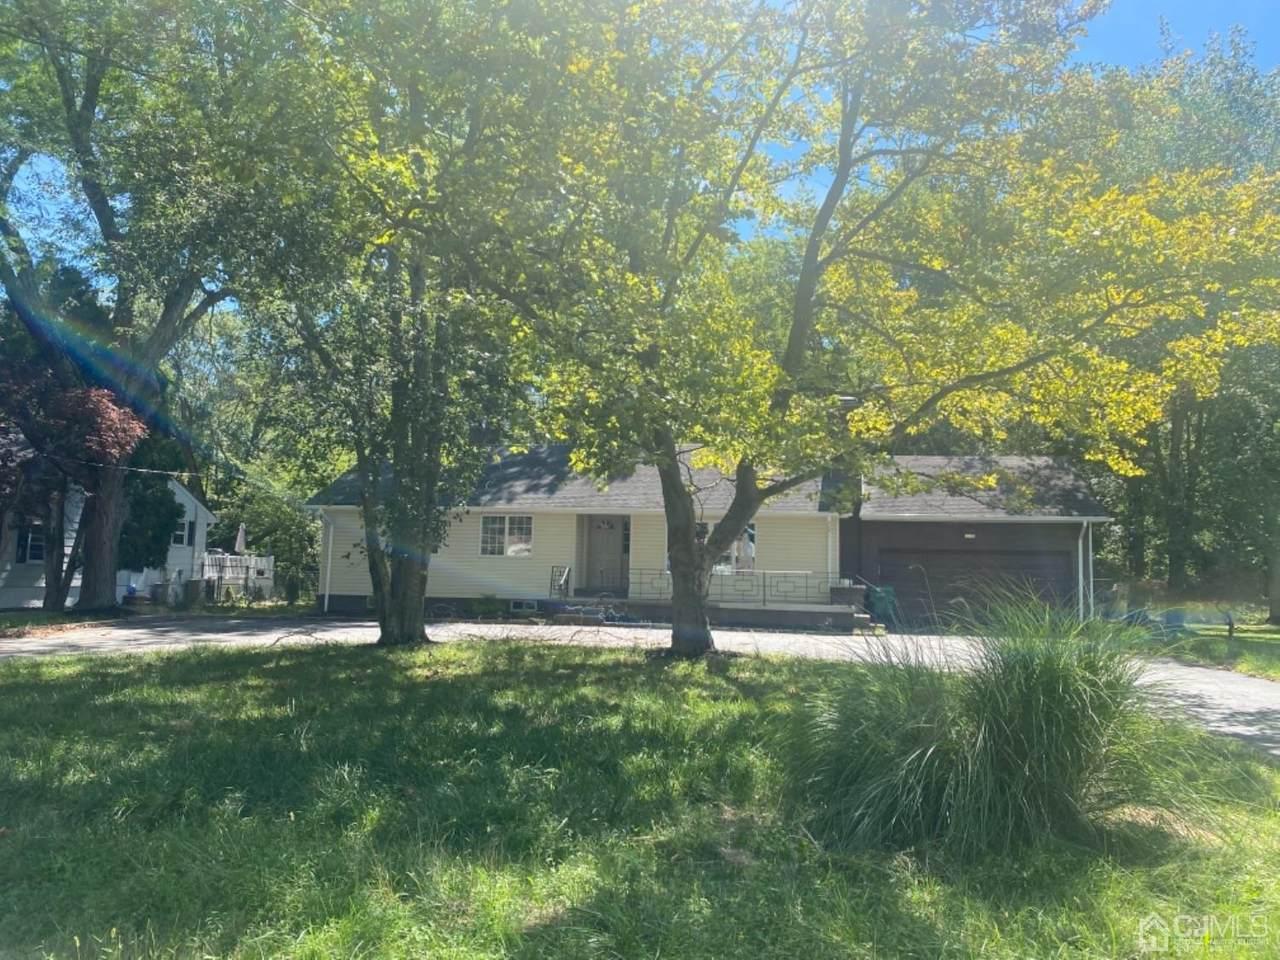 291 Penn Lawrenceville Road - Photo 1